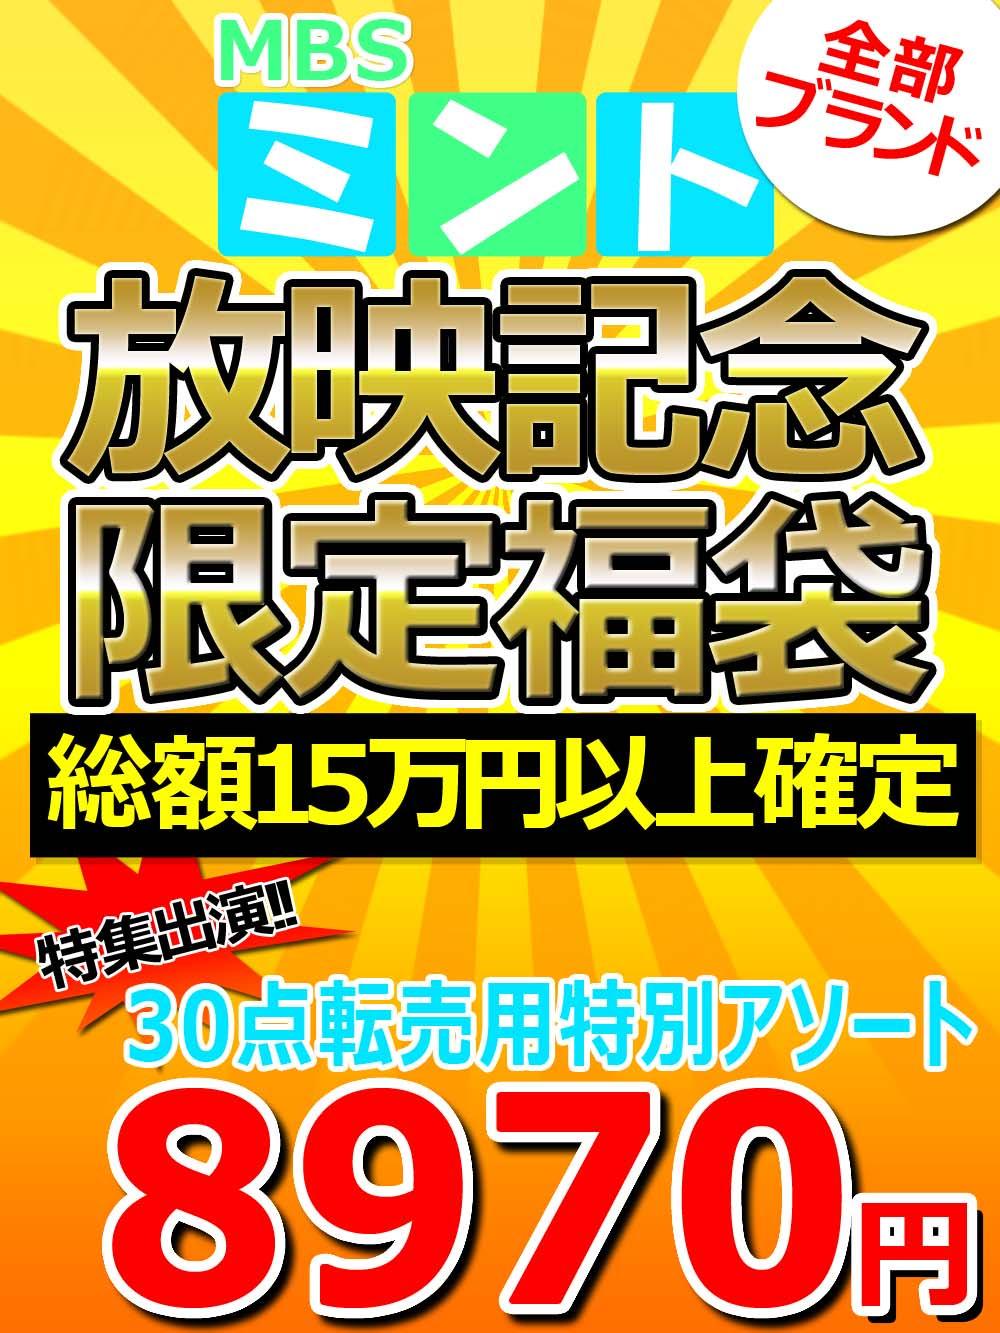 【MBS放送ミント出演!】放映記念特別福袋 総額15万円以上確定!転売用アソート【35点】8888